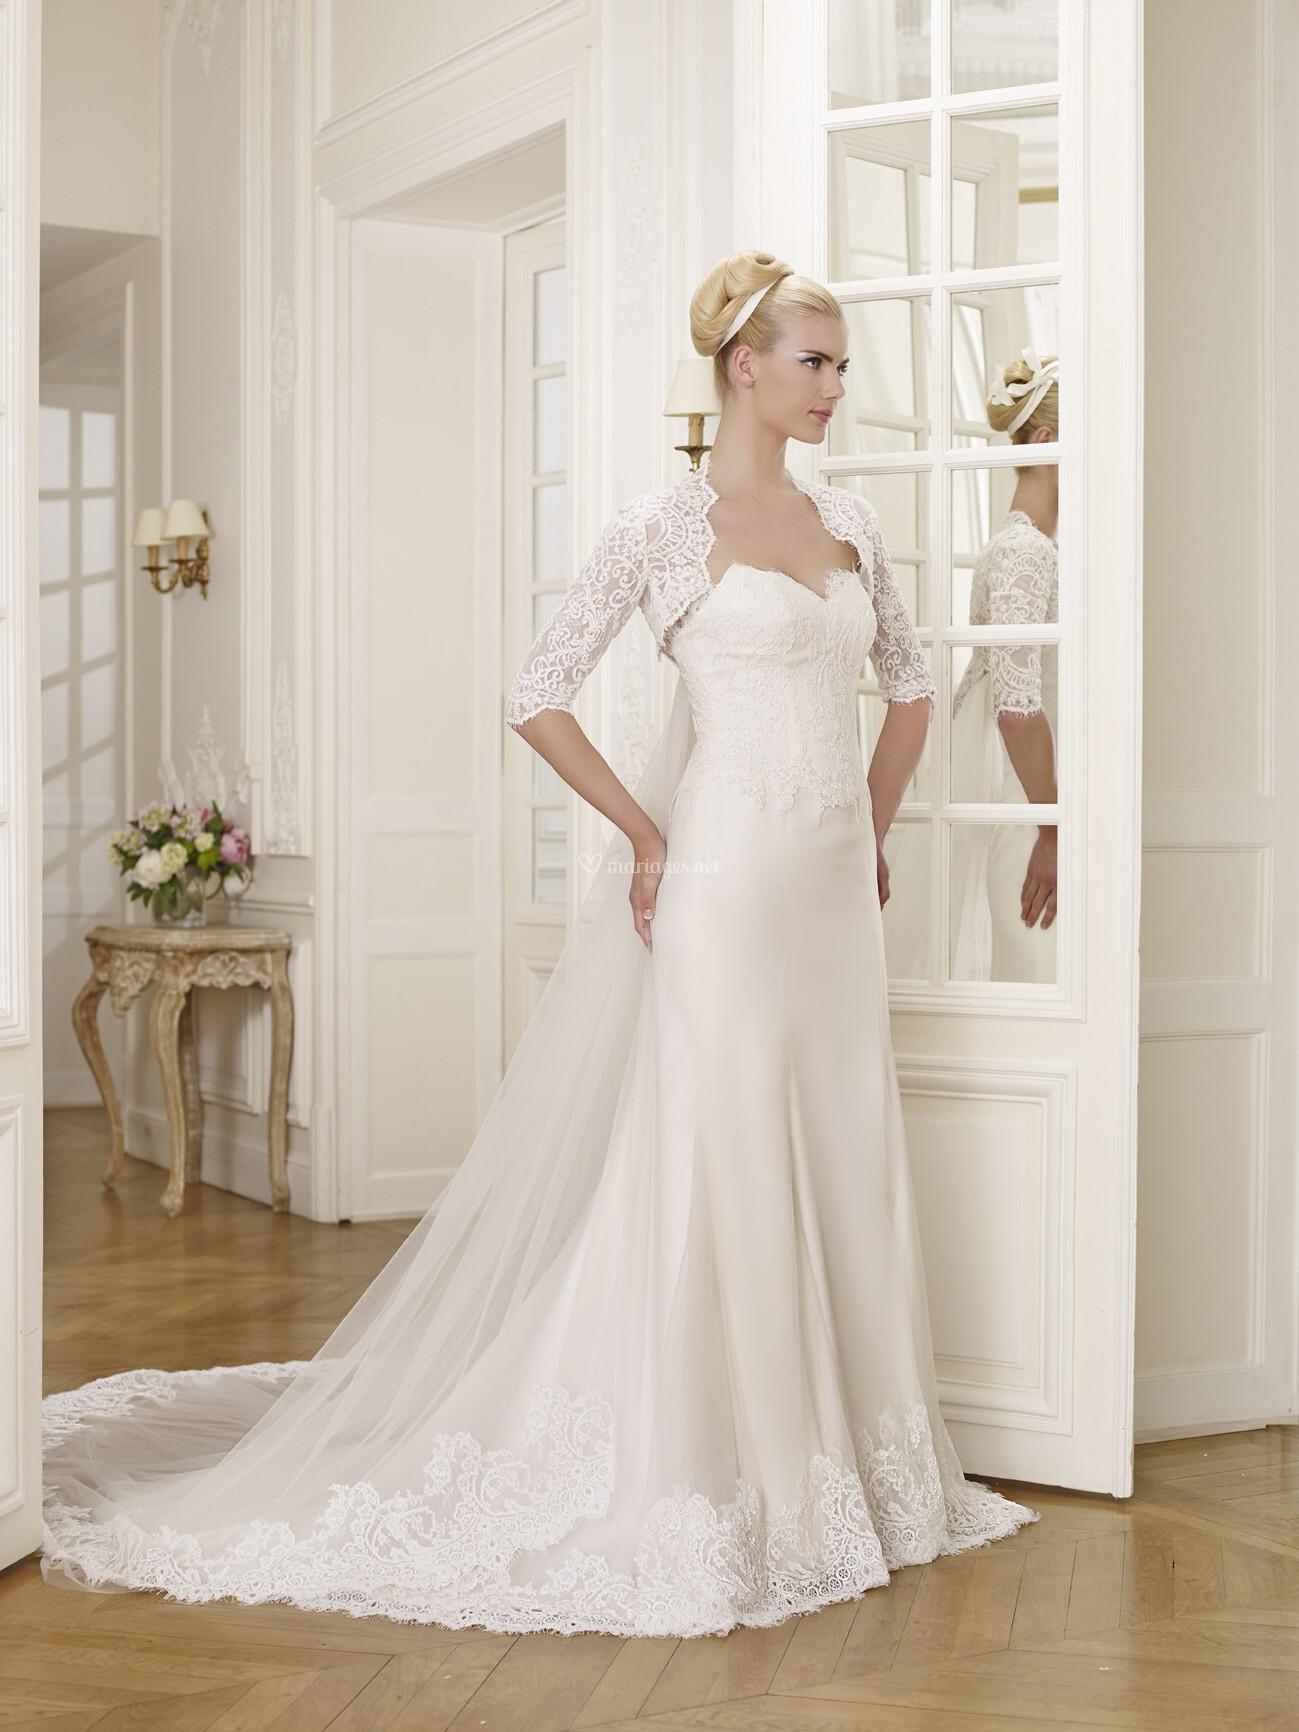 CHAMFORT - Robes de mariée - Pronuptia - Mariages.net